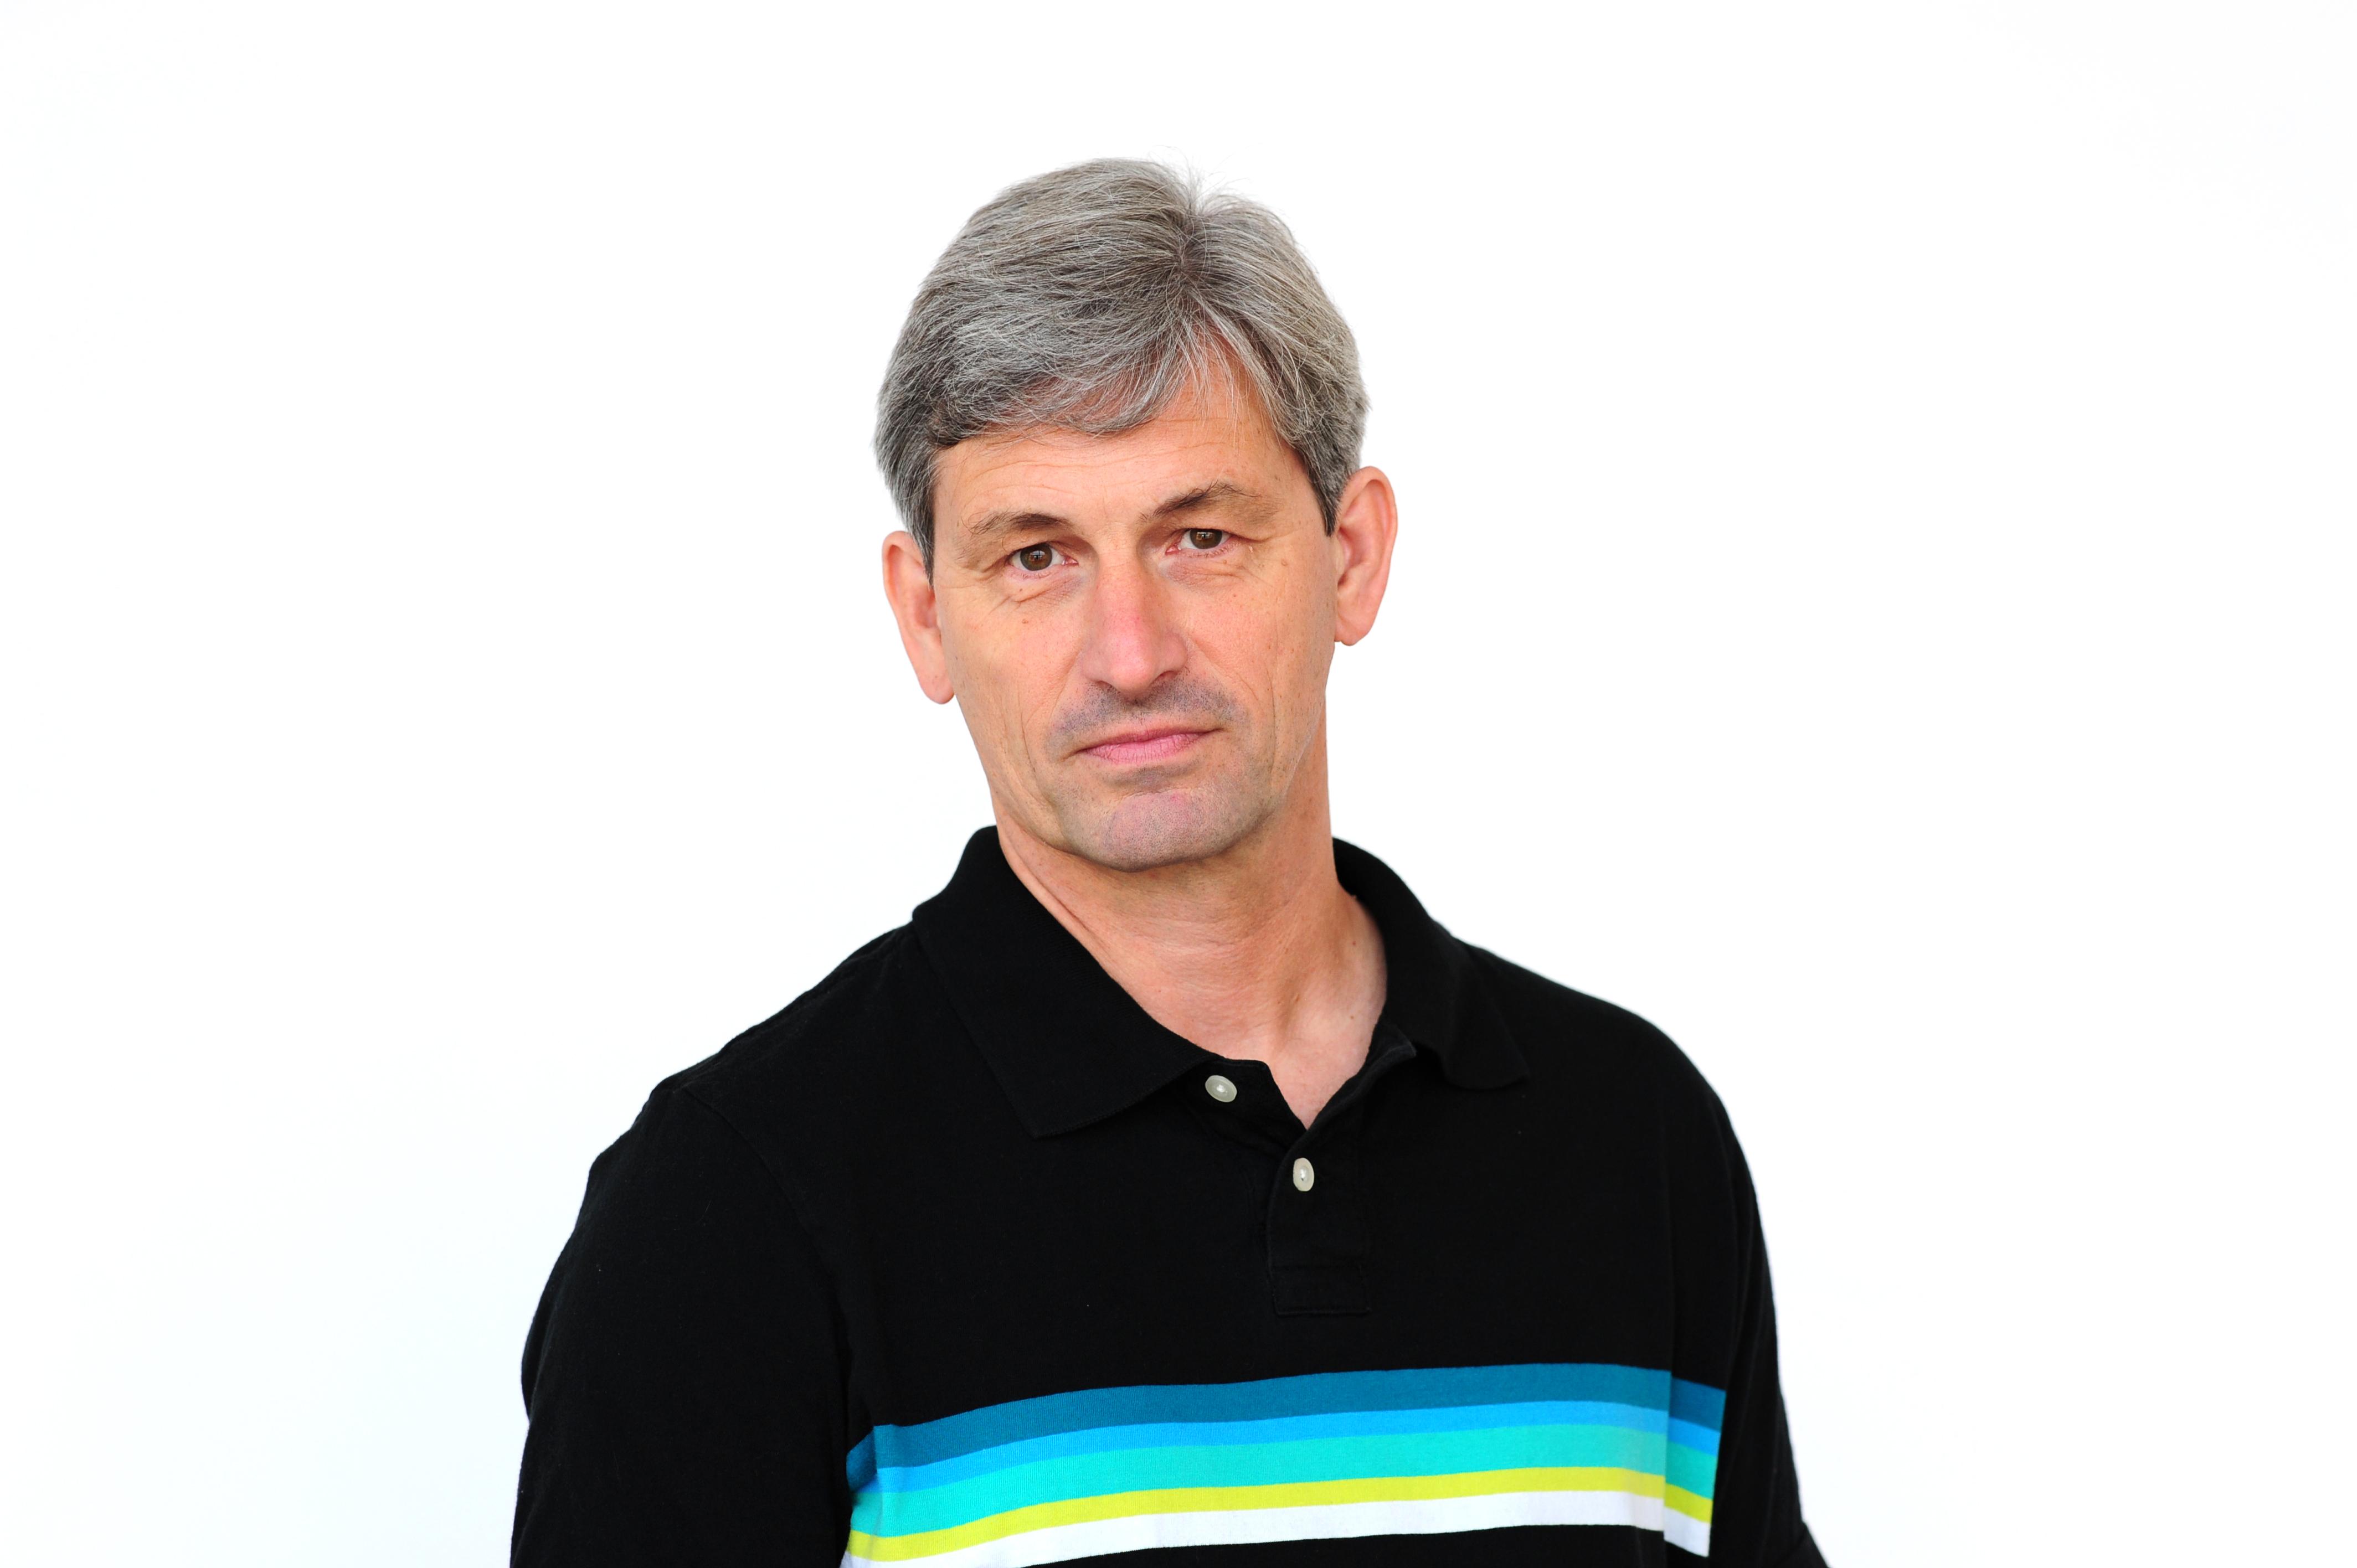 Michael Rass